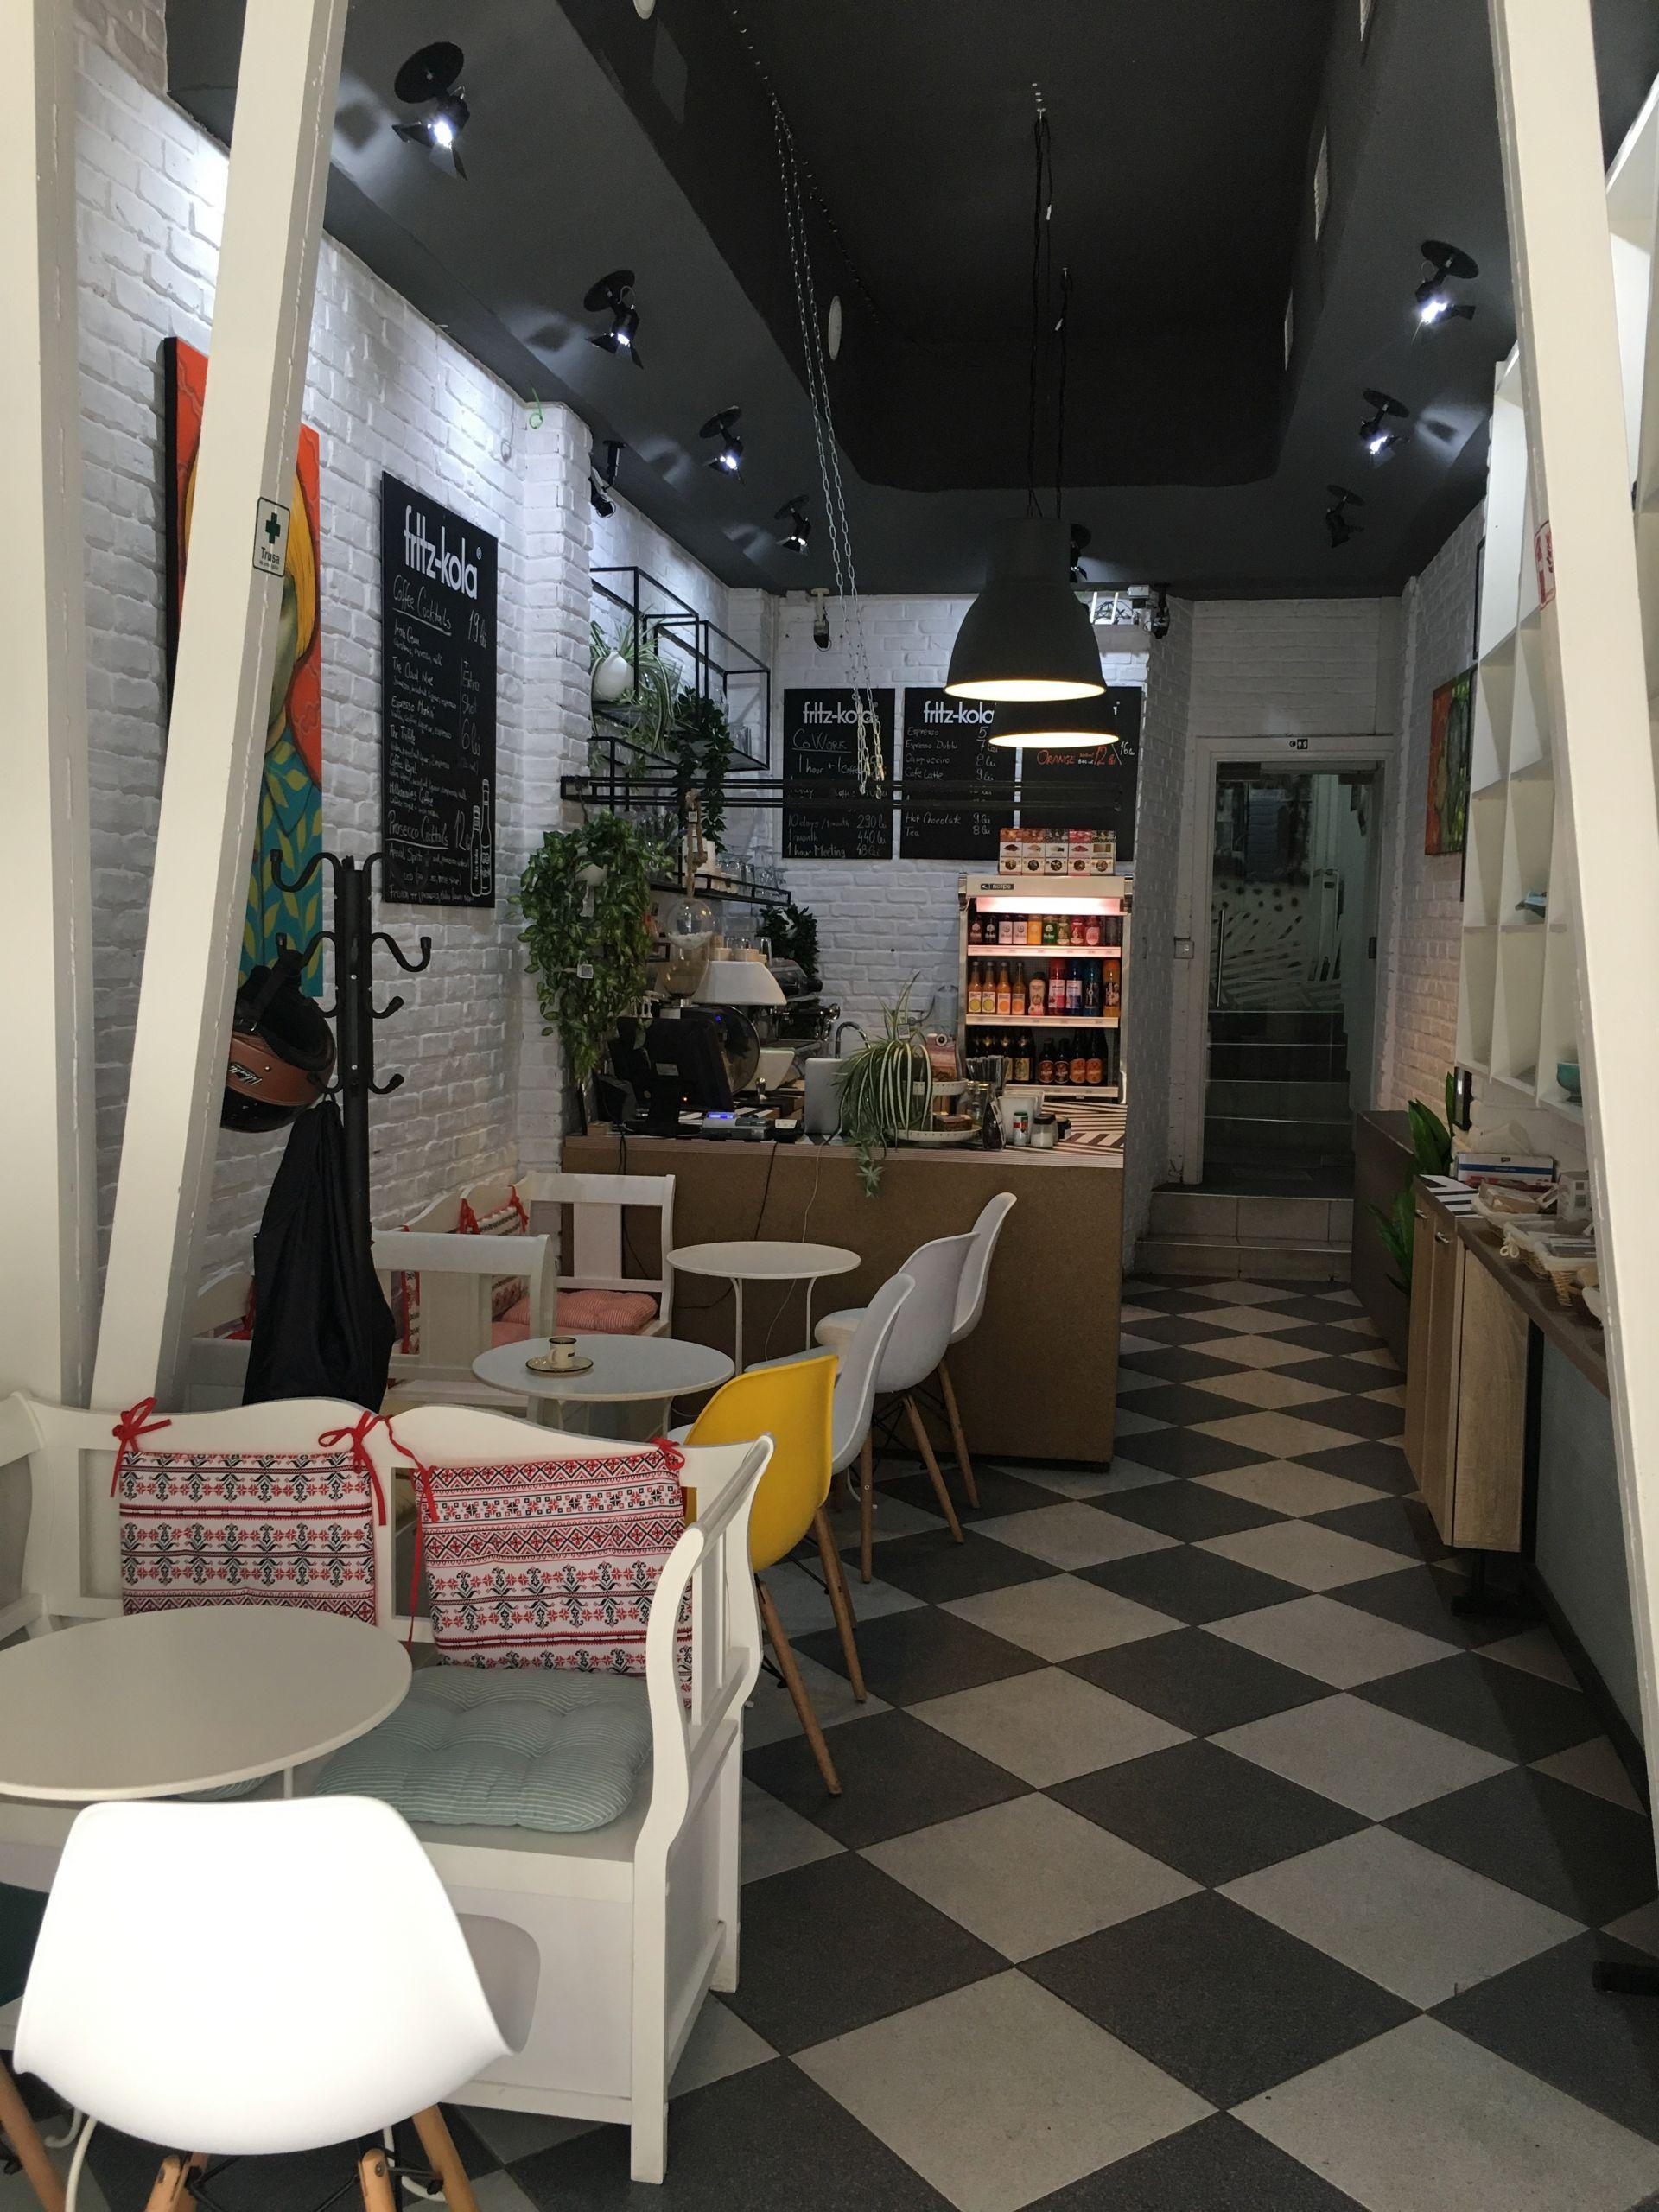 TheAtelier.ro Cowork Cafe, Bucharest